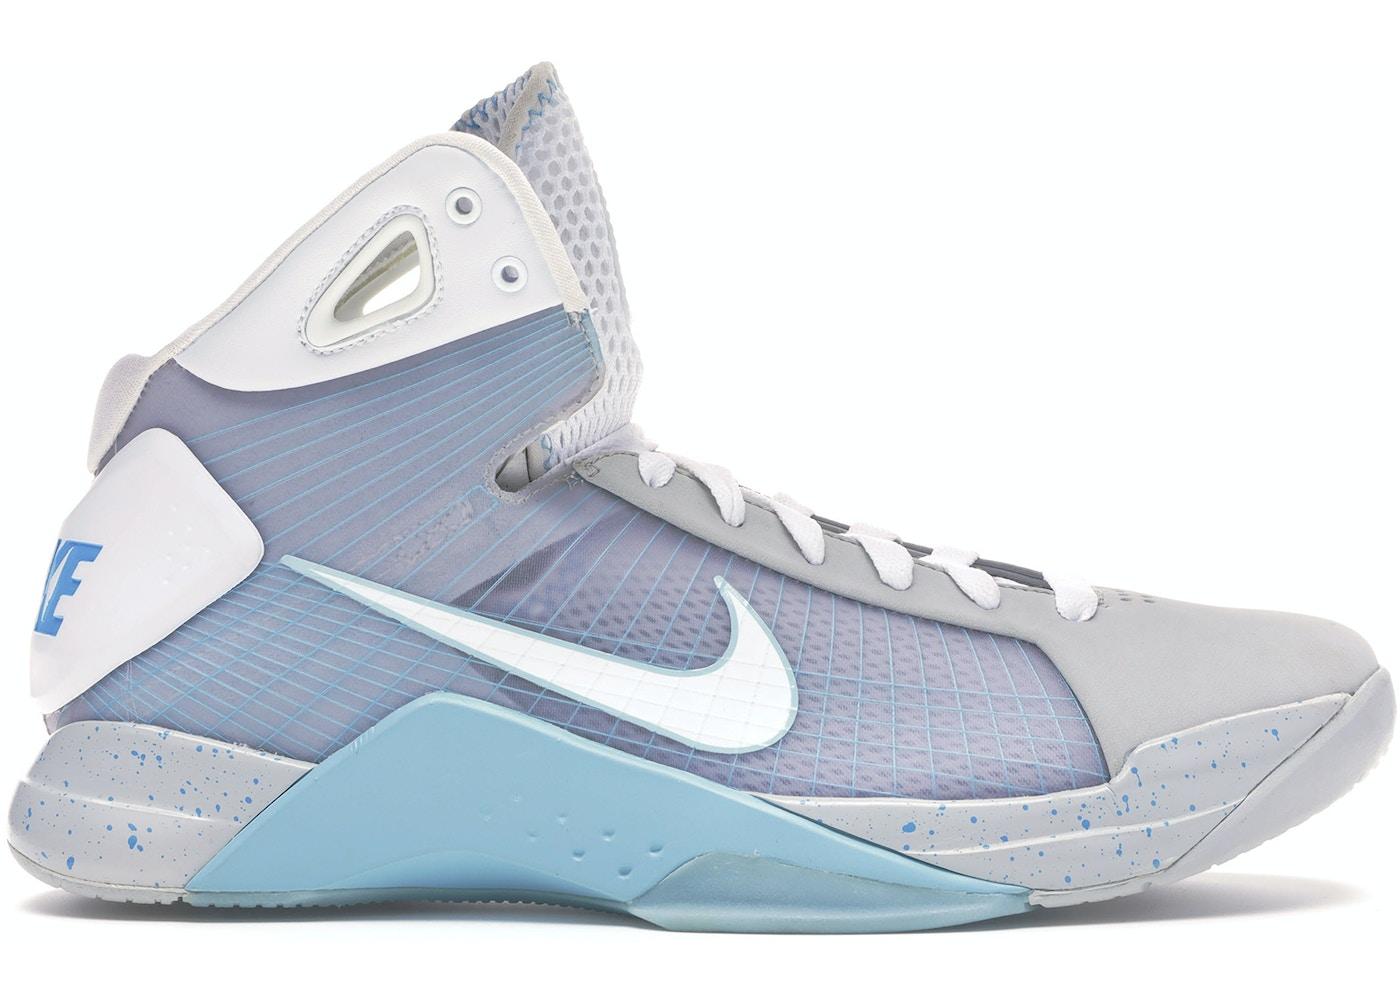 f792a269 Nike Hyperdunk Marty McFly 2015 - 333373-011